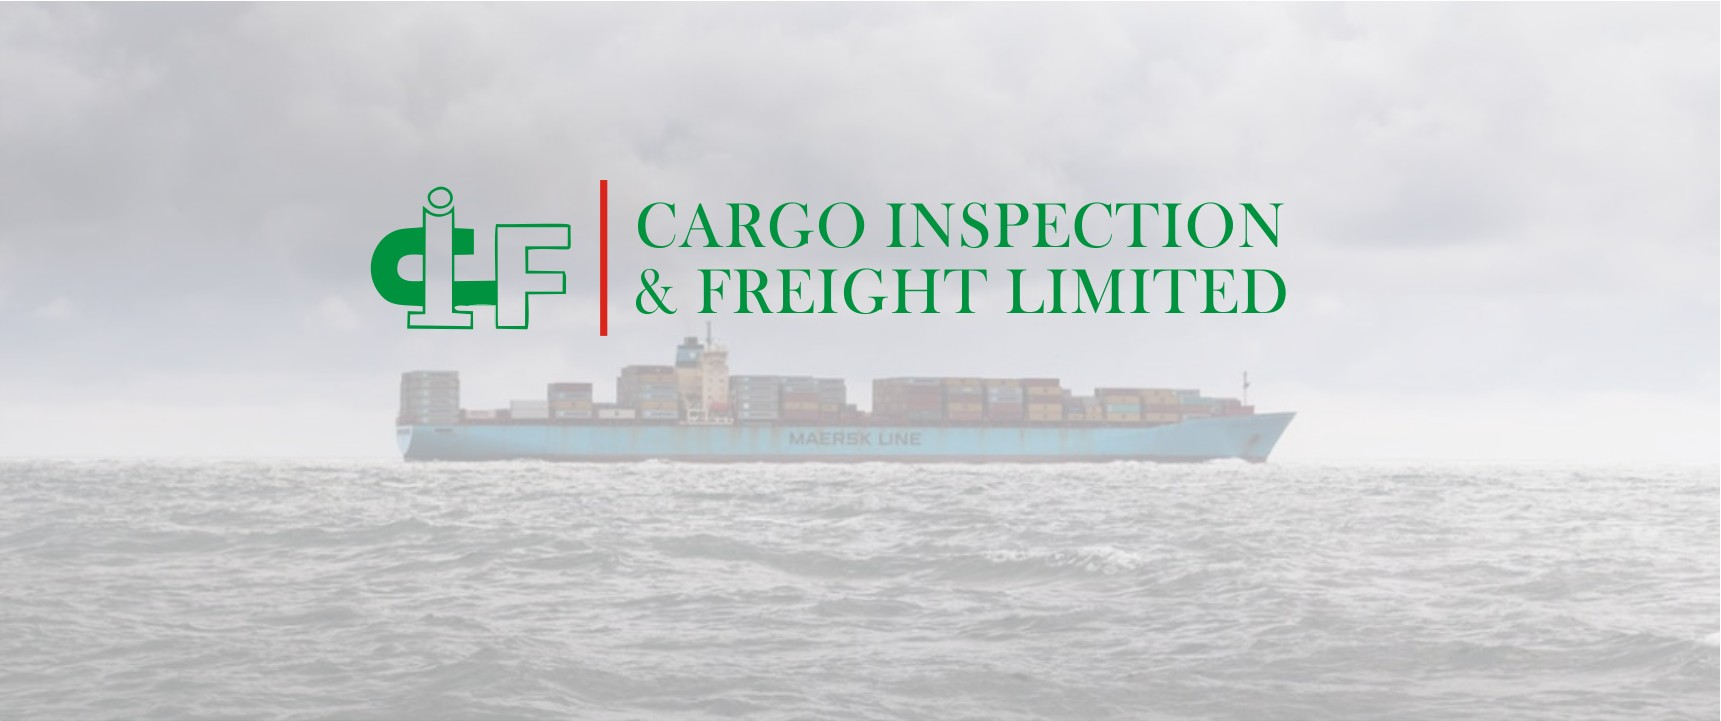 Cargo Inspection & Freight LTD | LinkedIn